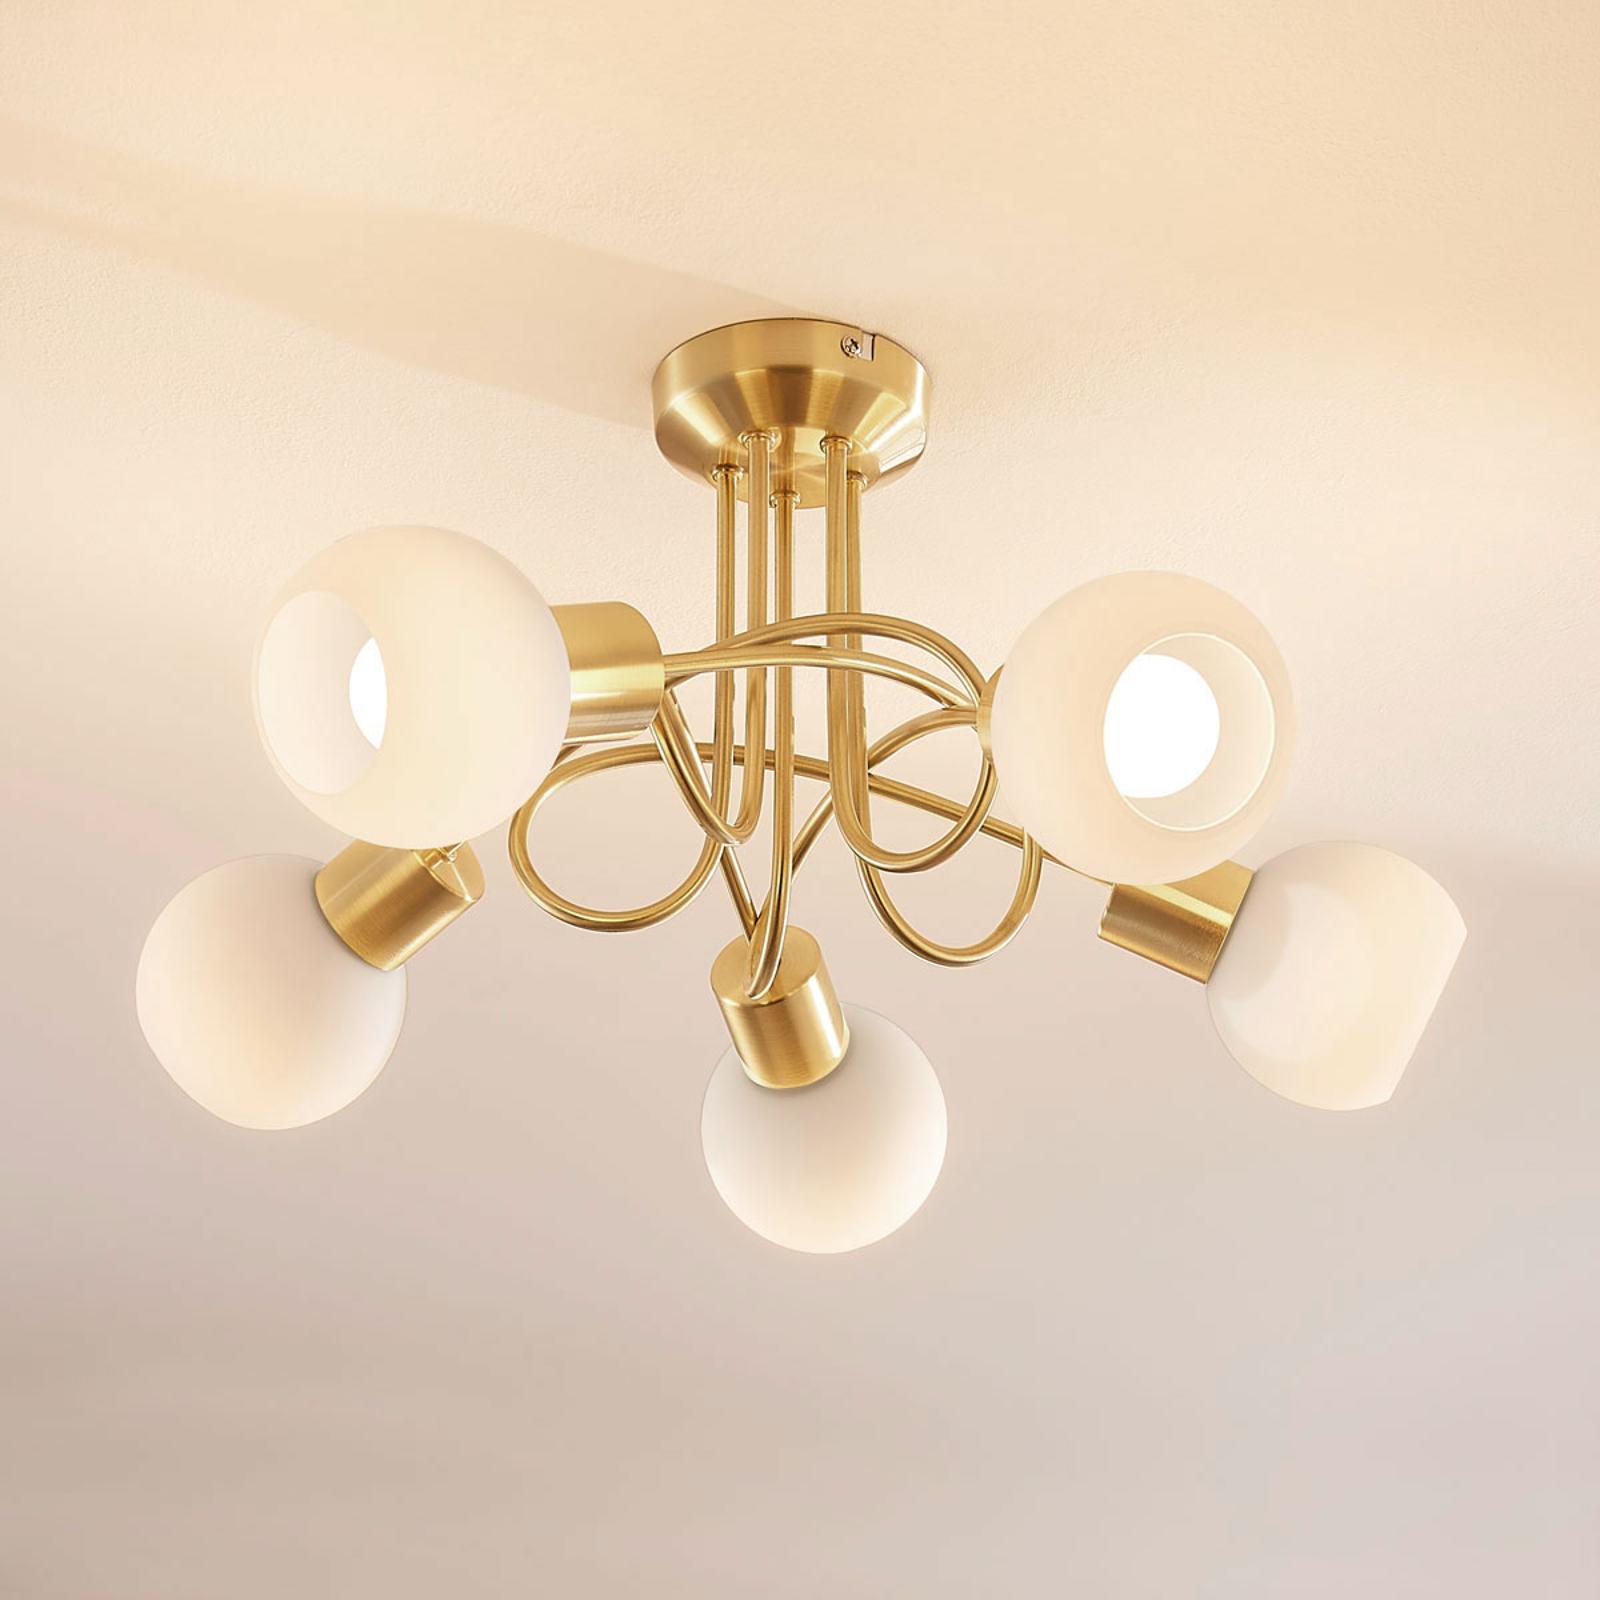 Mässingfärgad LED-taklampa Elaina, 5 ljuskällor